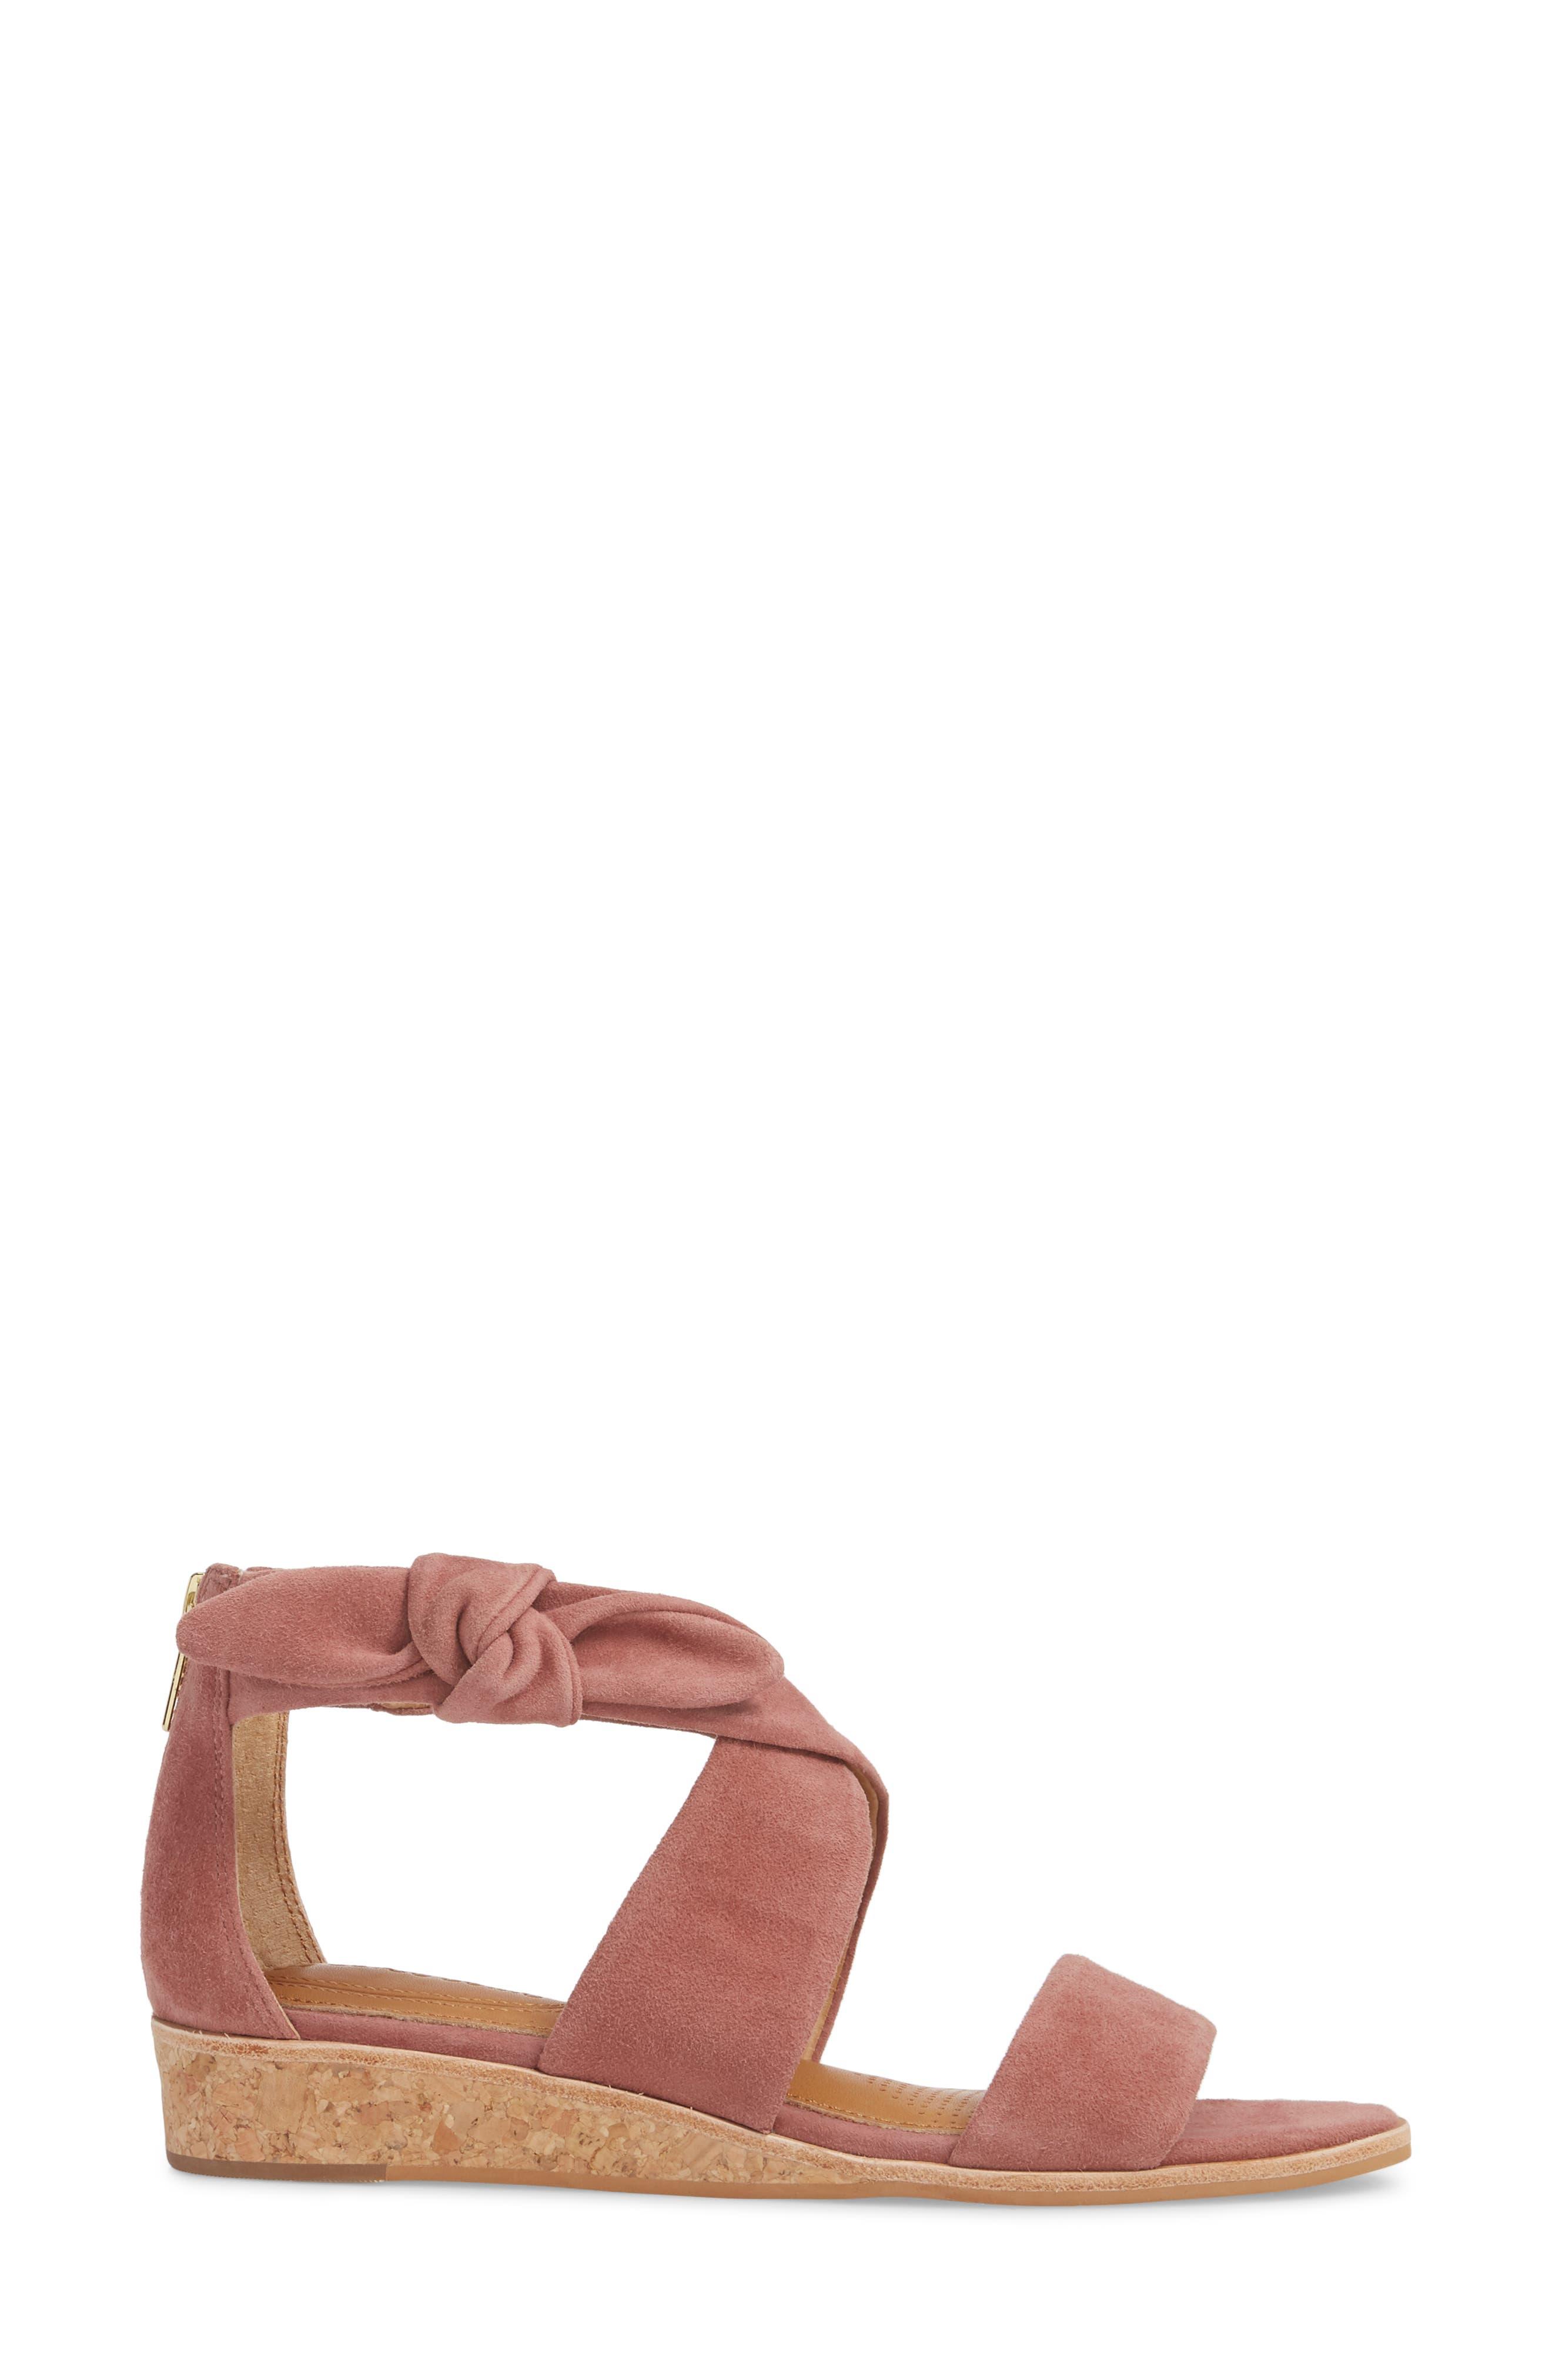 Rasque Sandal,                             Alternate thumbnail 3, color,                             Old Rose Leather